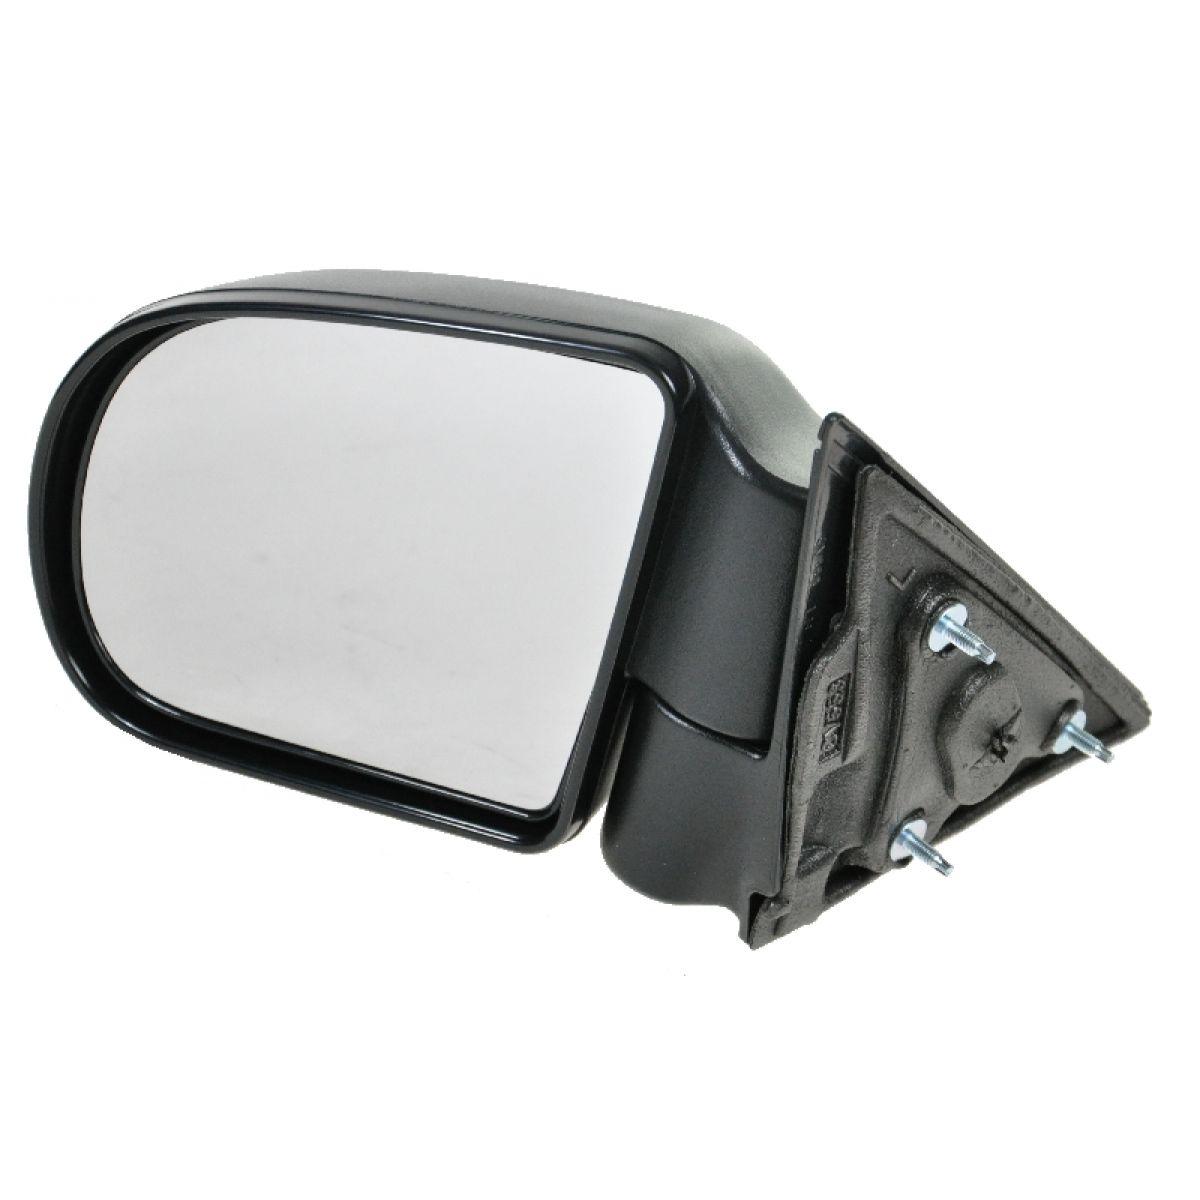 S10 S15 Pickup Truck /& S10 Blazer S15 Jimmy Drivers Side Manual Mirror Textured